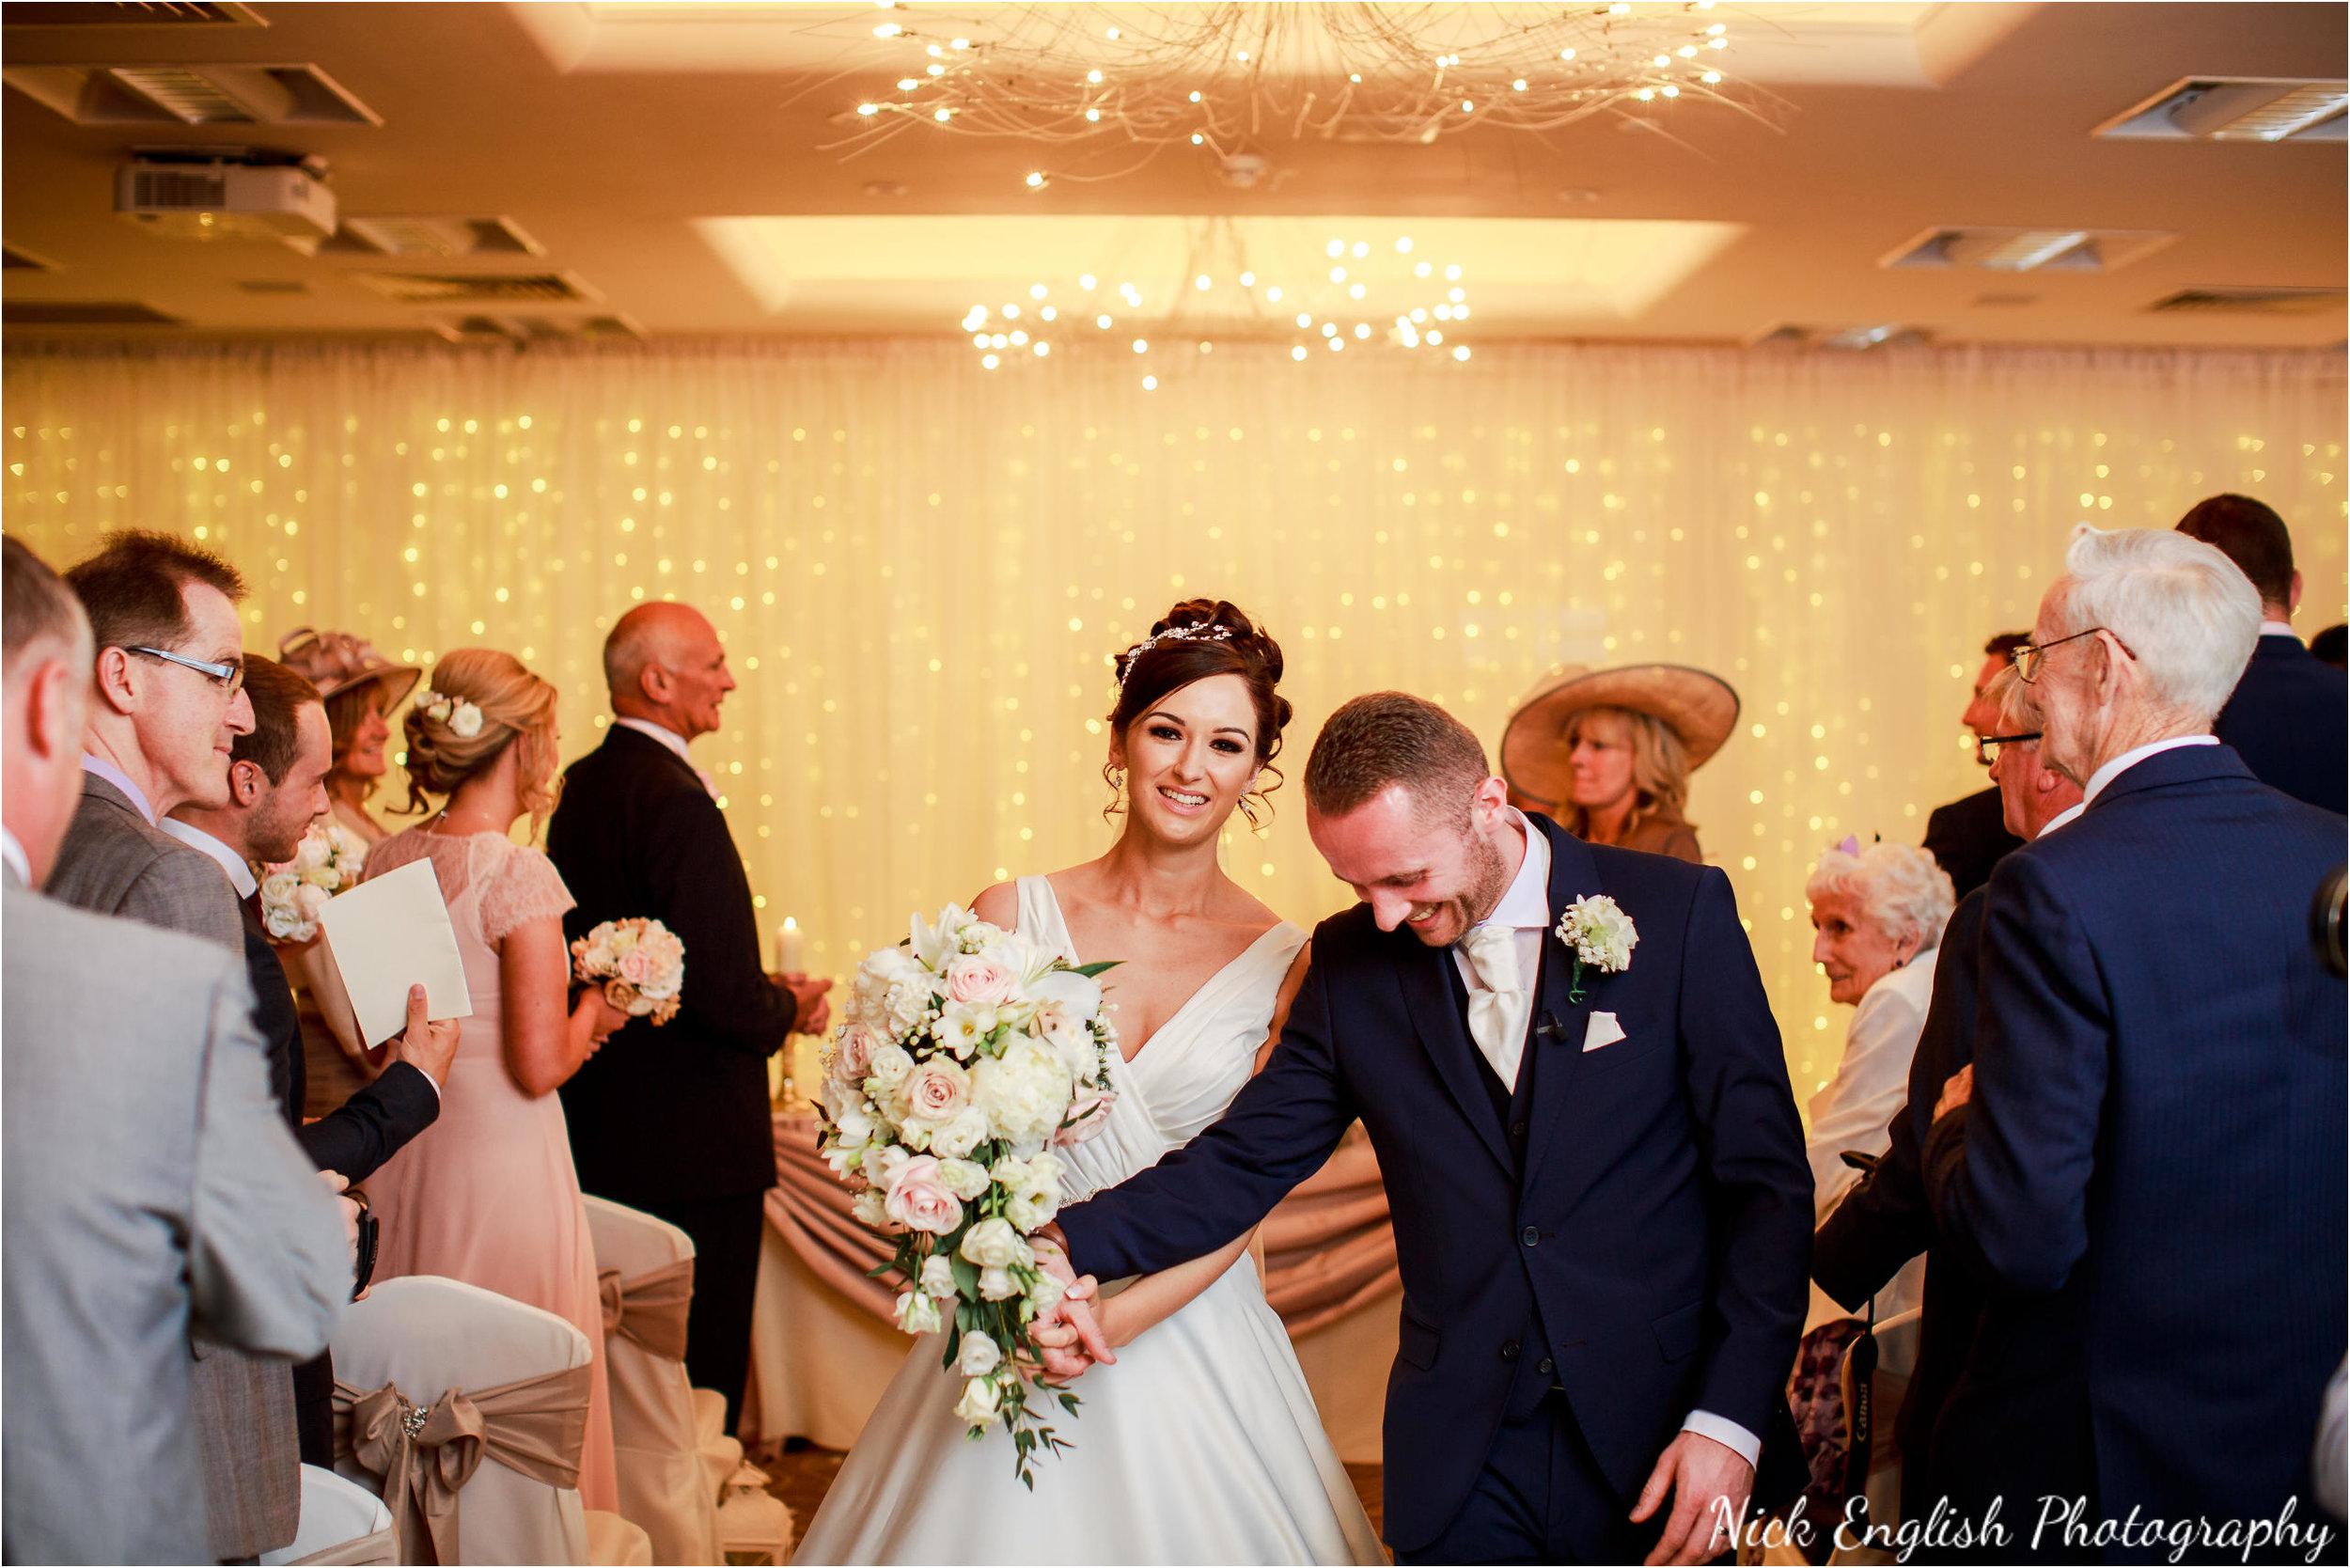 Emily David Wedding Photographs at Barton Grange Preston by Nick English Photography 82jpg.jpeg